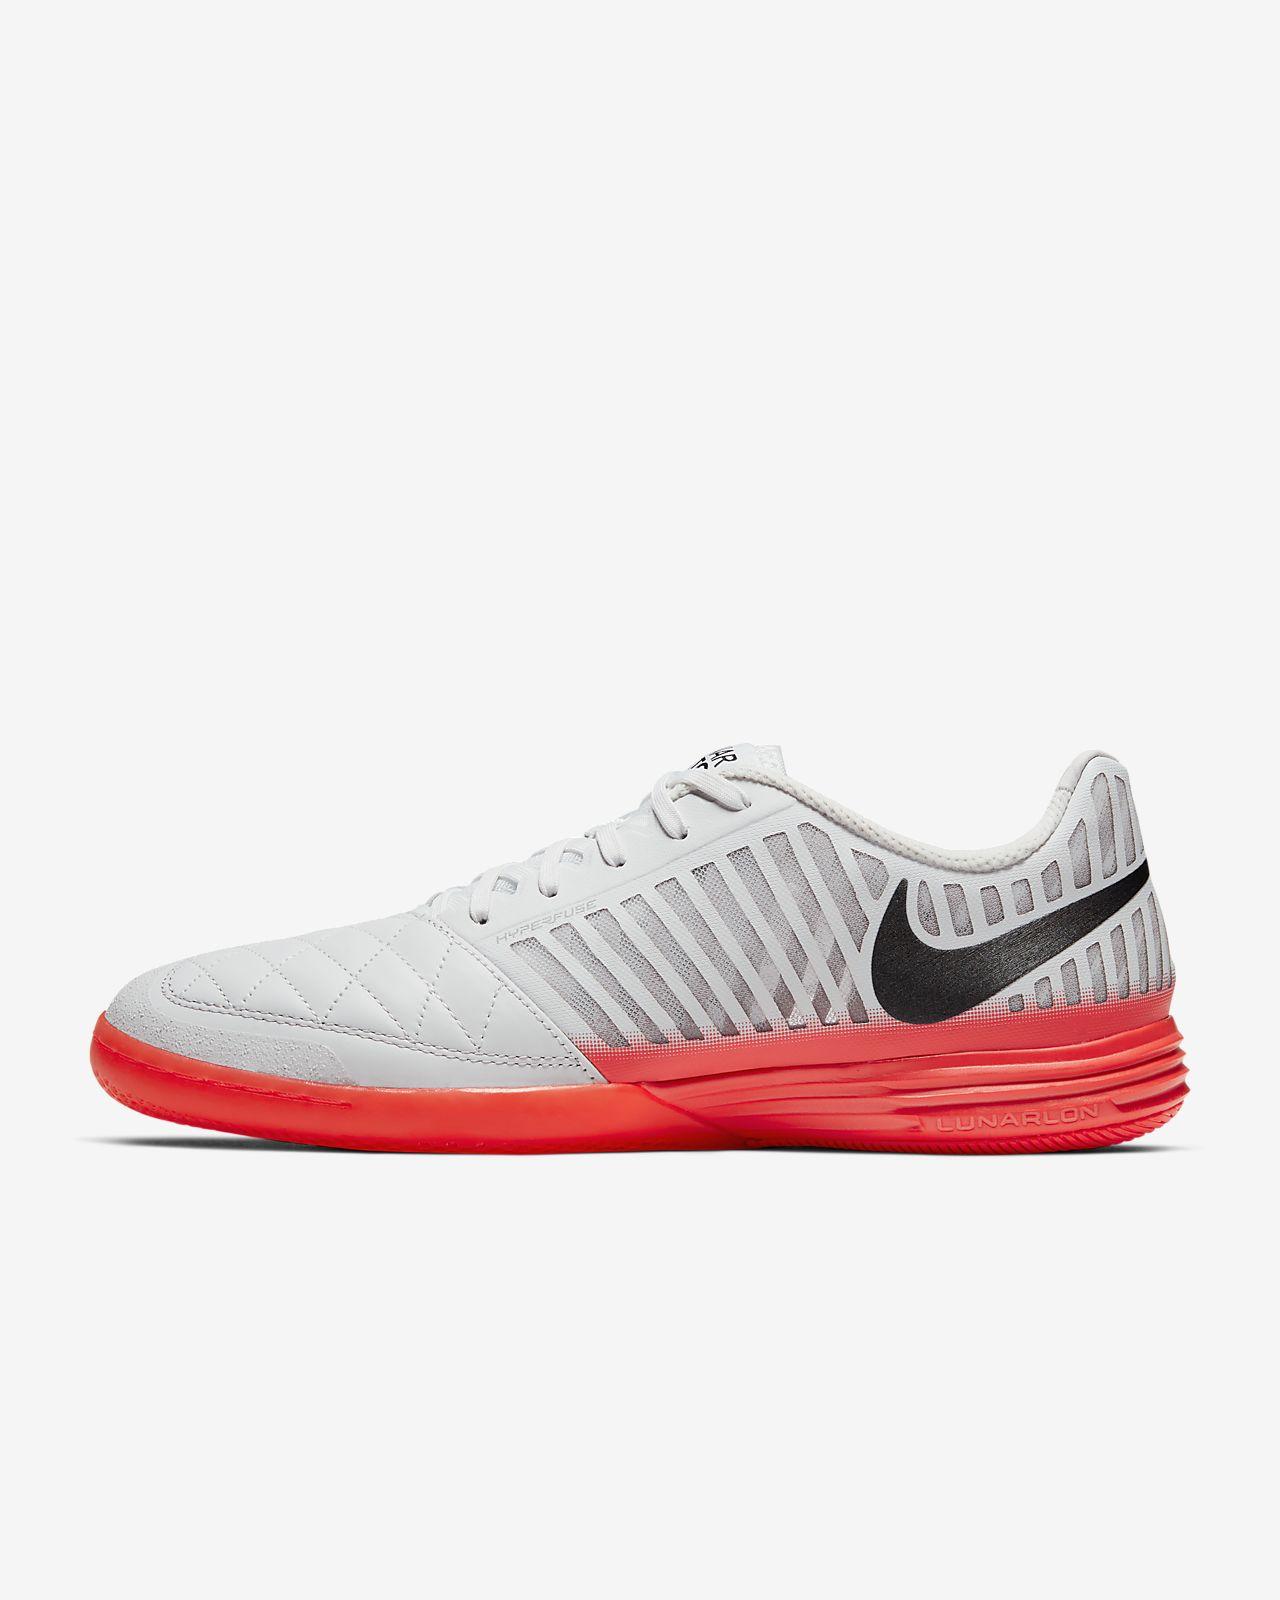 Nike Lunar Gato II IC Indoor Court Football Shoe. Nike MA